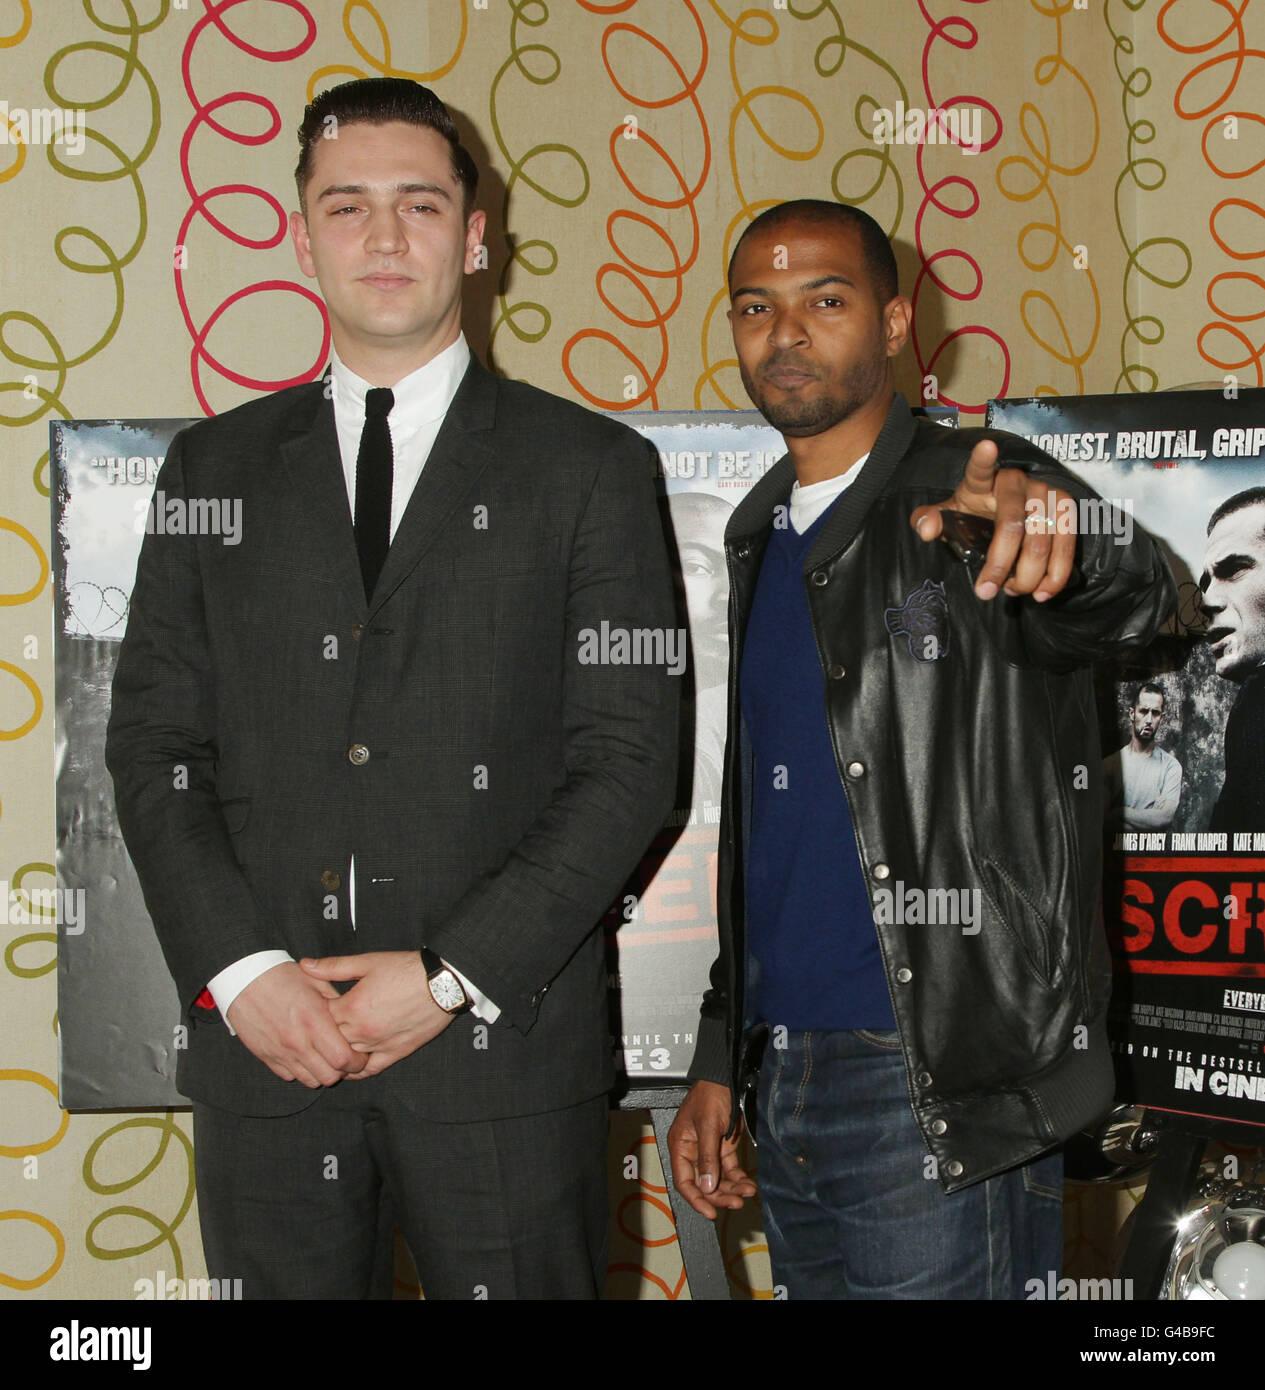 Screwed premiere - London - Stock Image